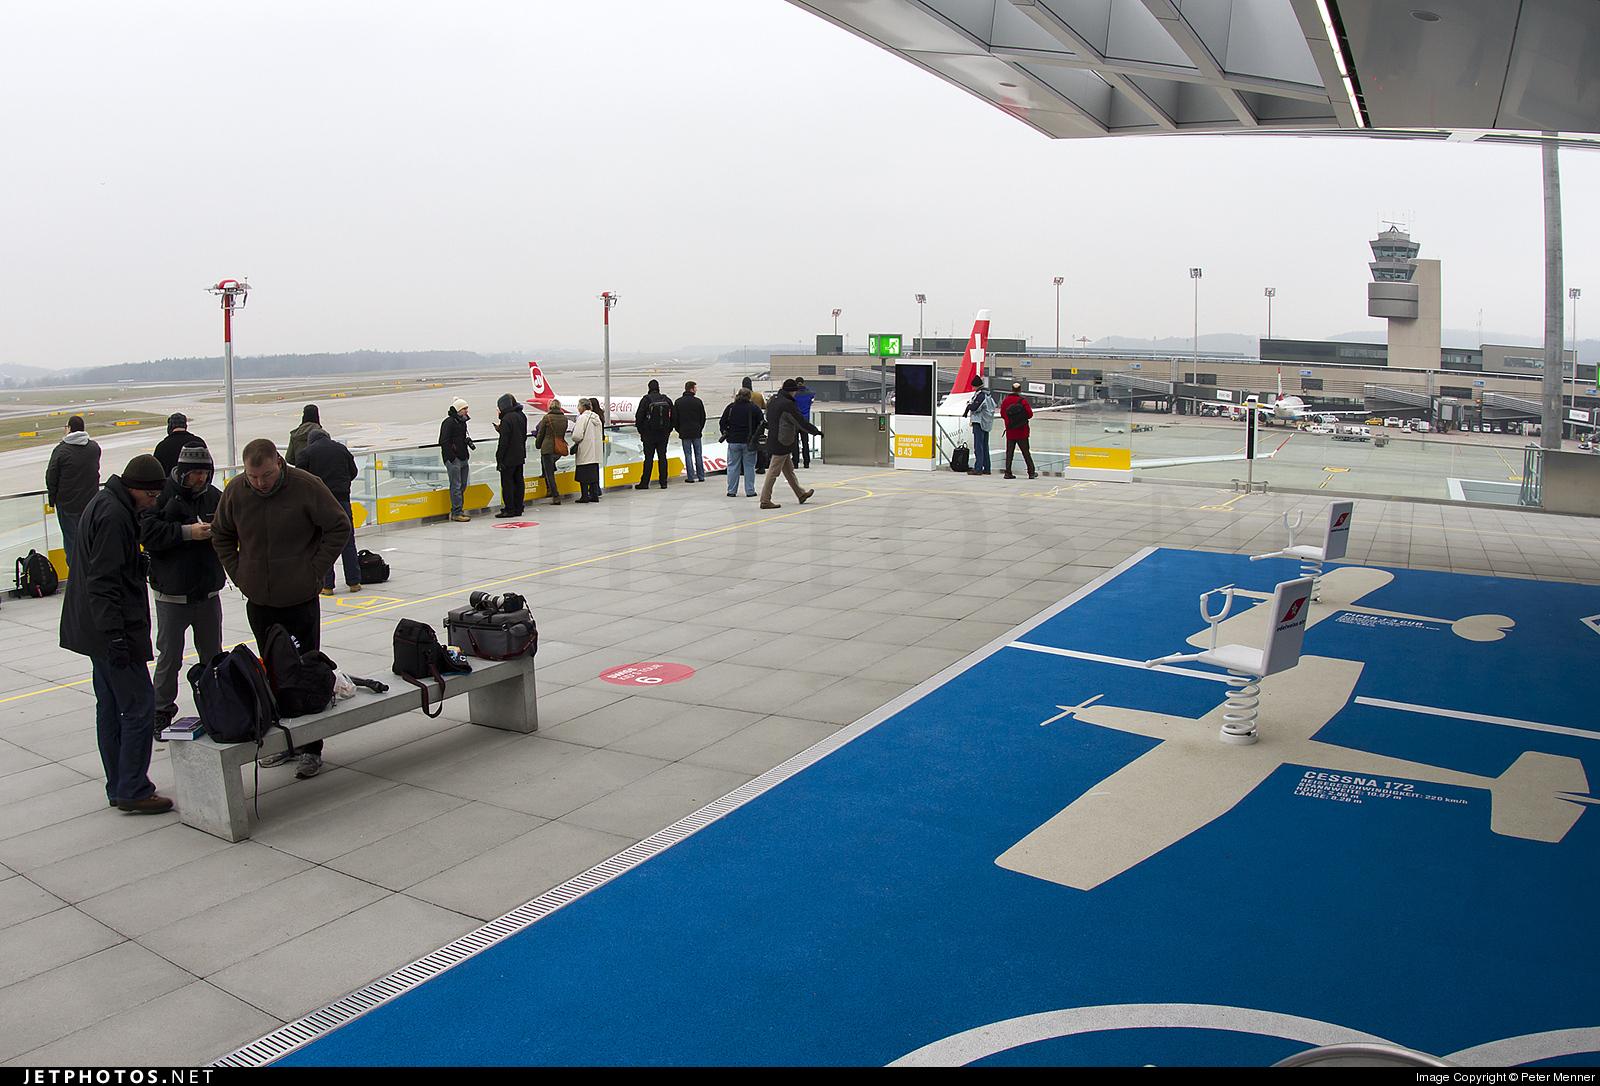 LSZH - Airport - Spotting Location